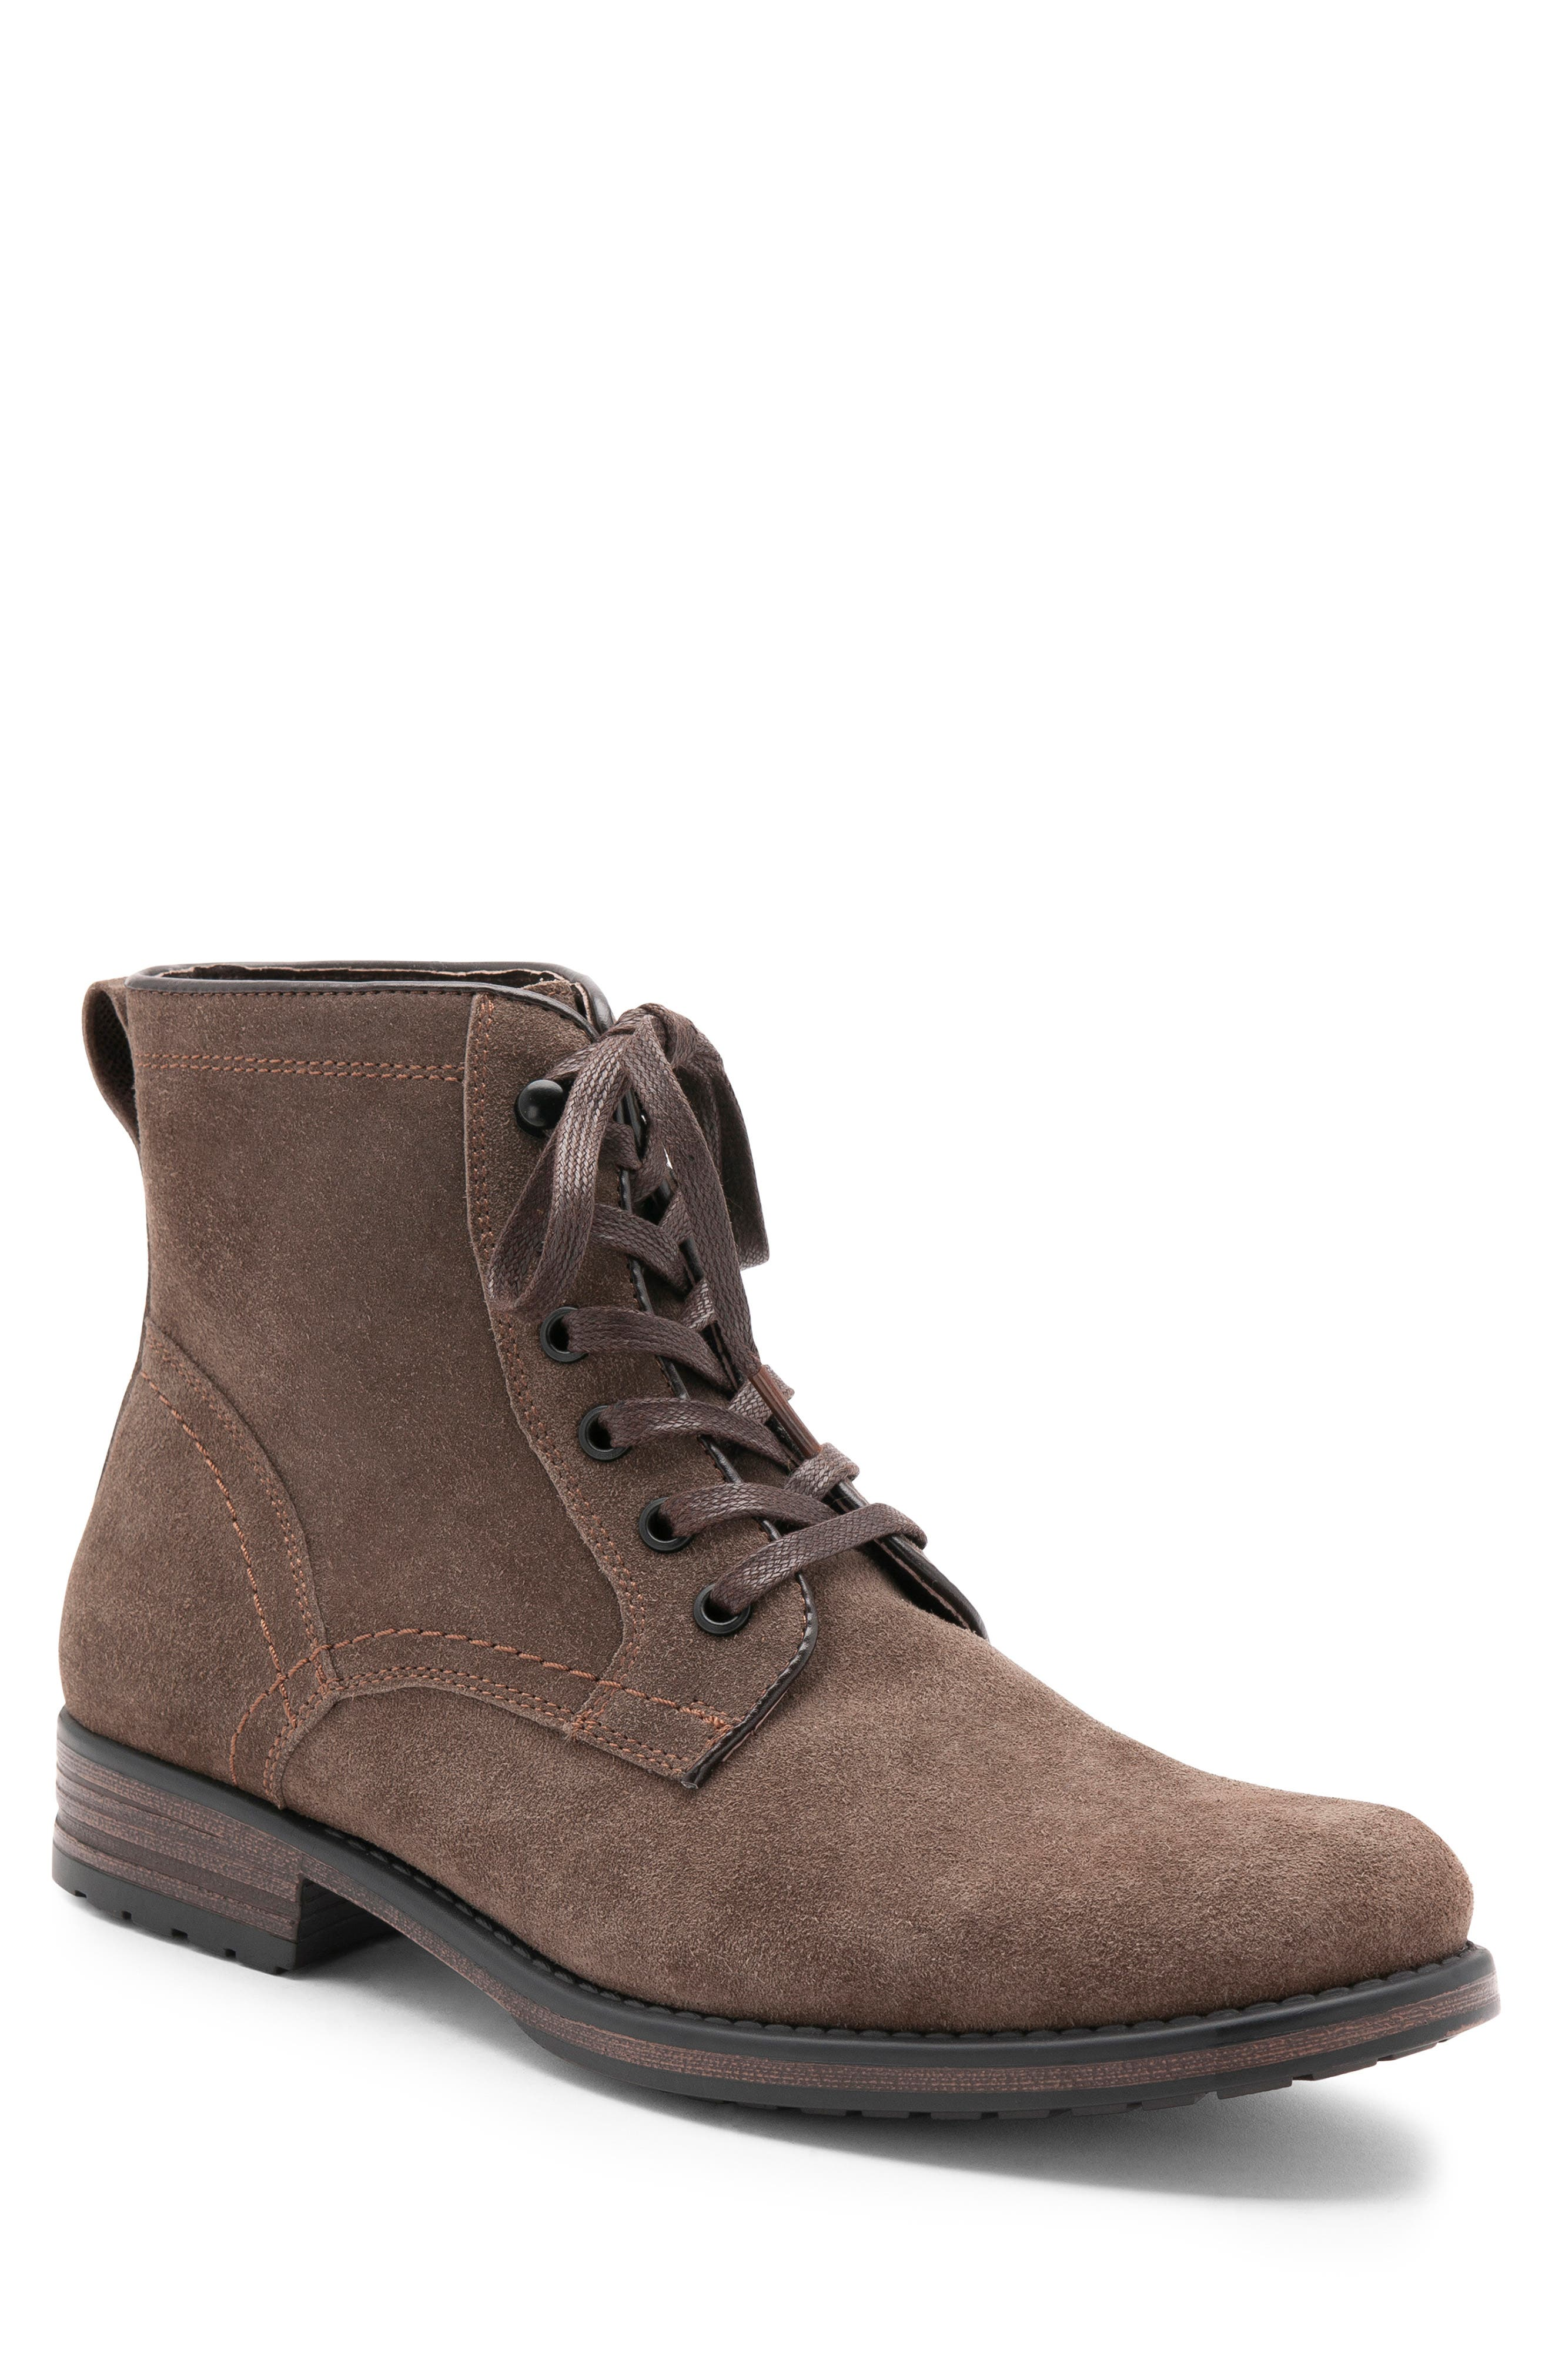 Blondo Peter Waterproof Plain Toe Boot, Brown